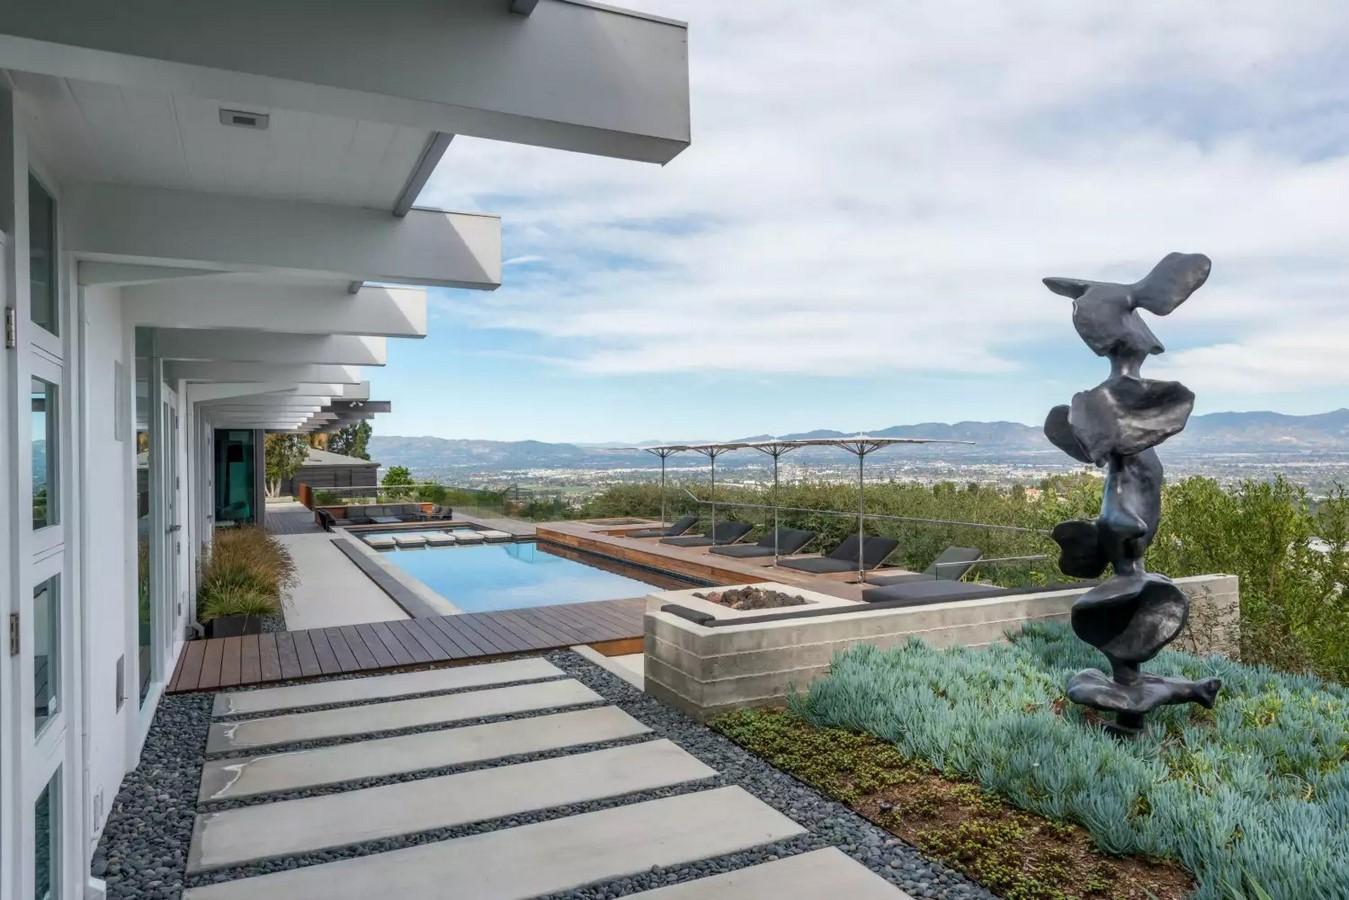 Backyard Design - Sherman Oaks hilltop home, USA